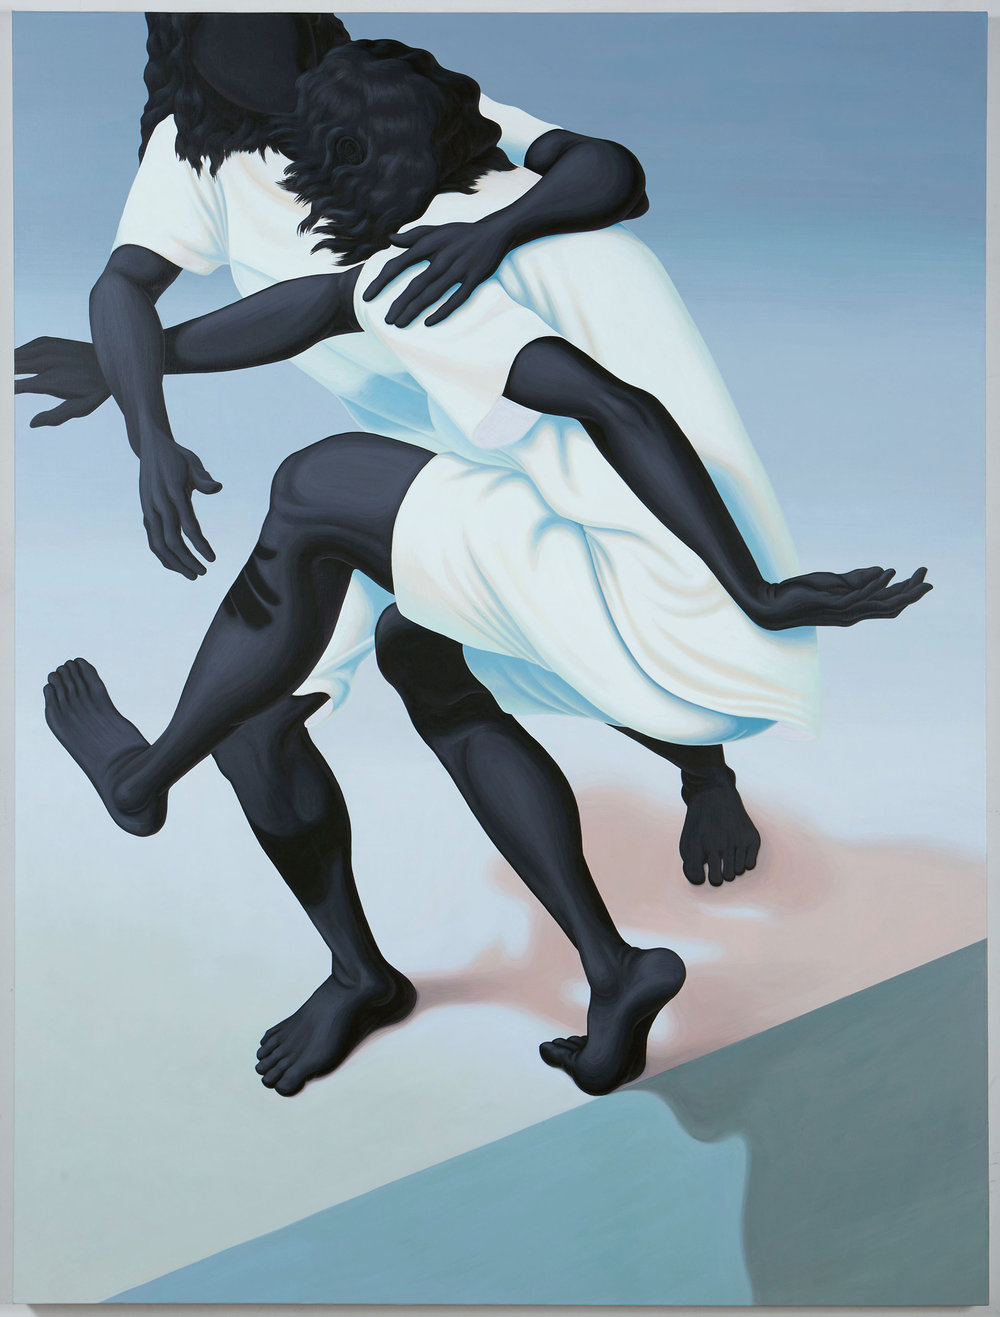 Alex Gardner  - Peptalk on PCH , 2017, acrylic on linen, 162.5 x 122 cm.Image courtesy The Hole.